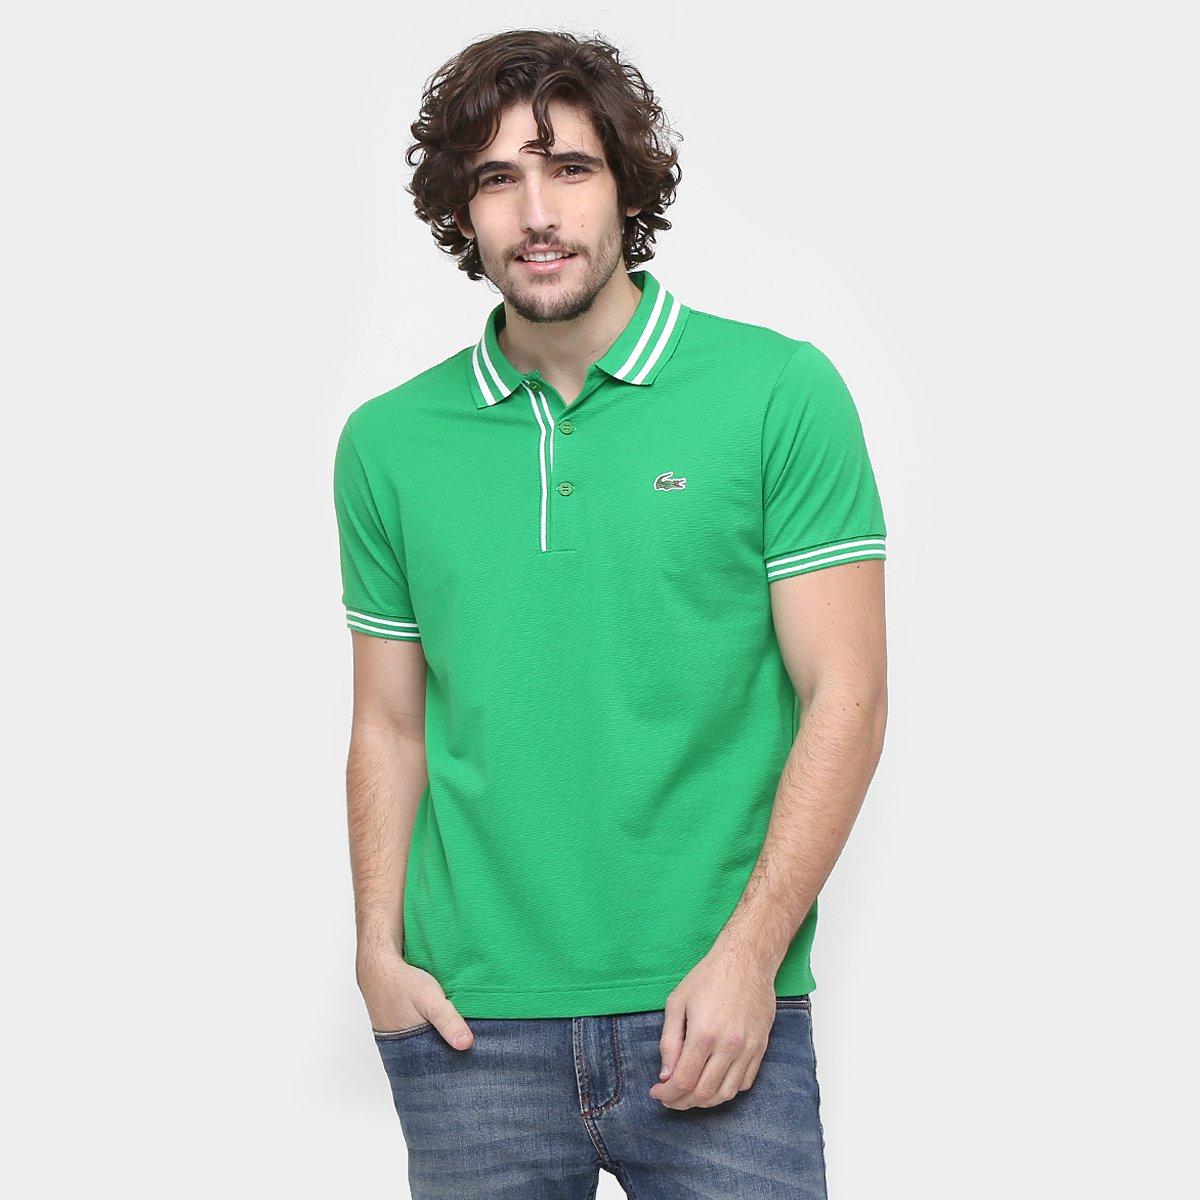 0de563312f Camisa Polo Lacoste Listrada Fancy - Compre Agora